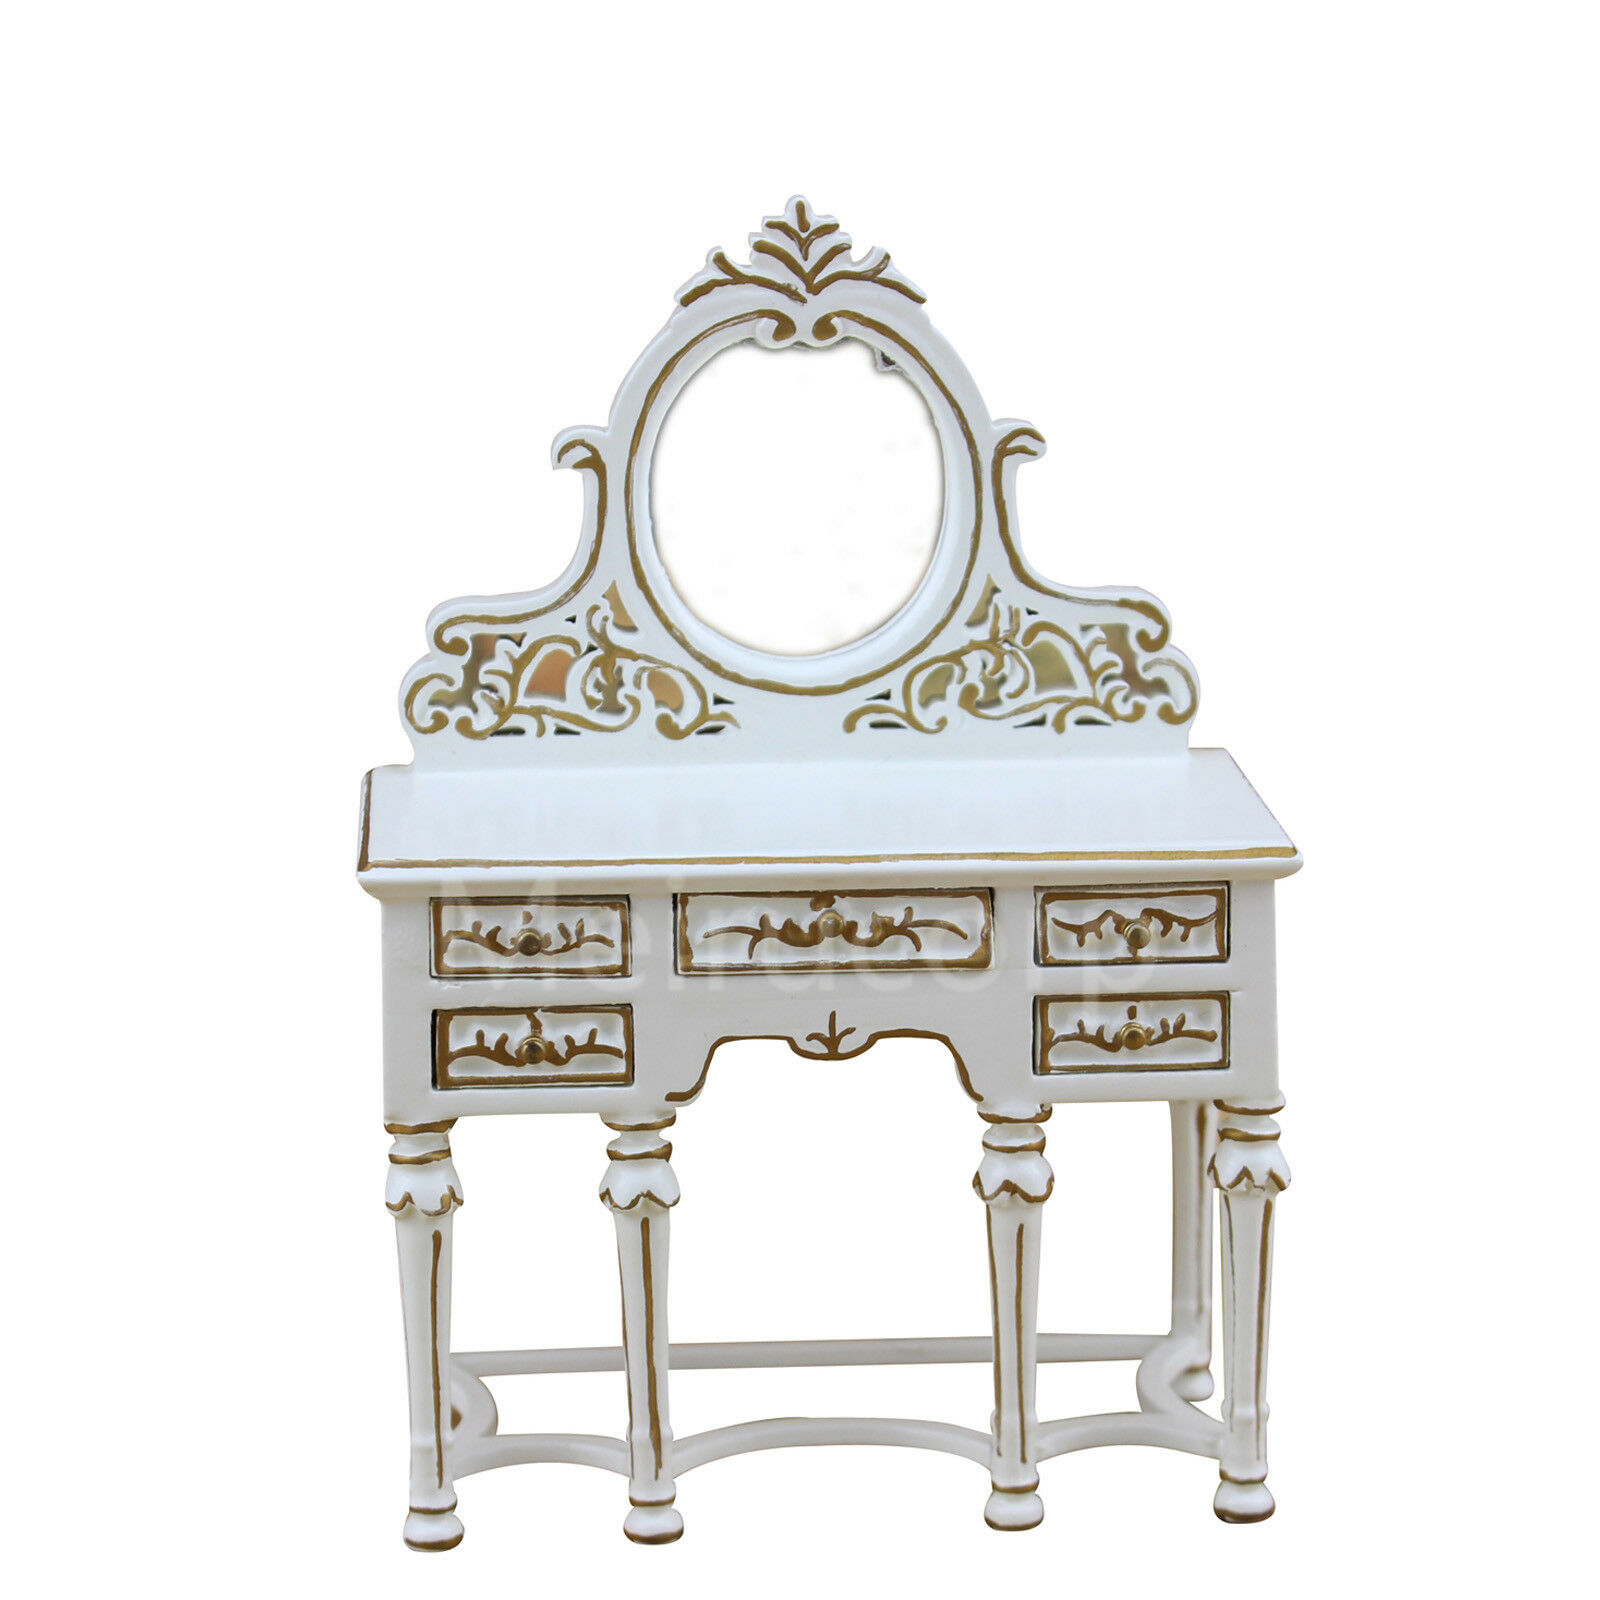 Casa de muñecas en miniatura Muebles 1 12 escala blancoo hecho a mano Dorado De Tocador